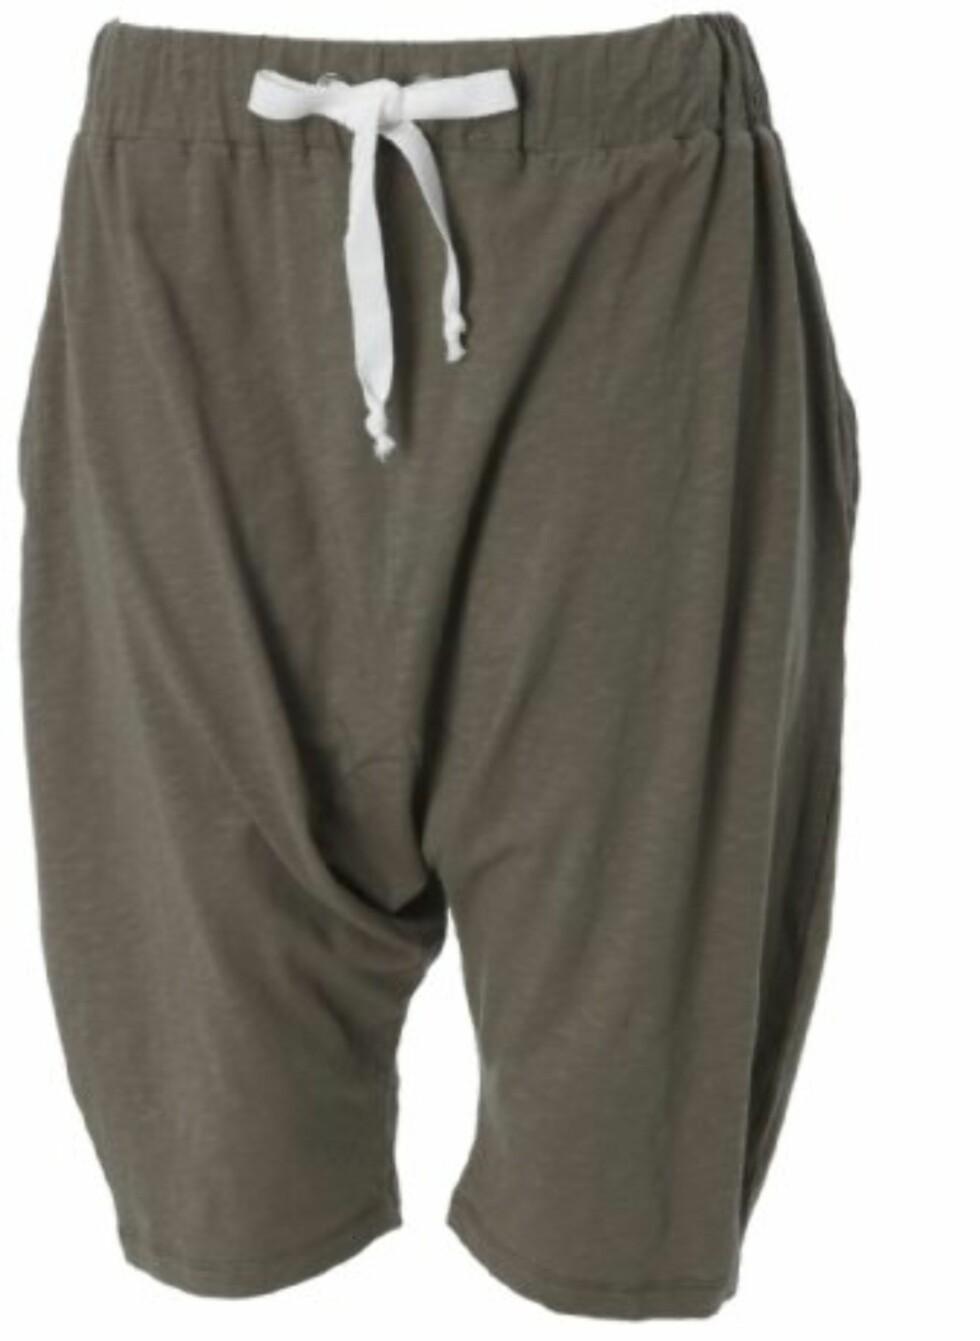 En blanding mellom joggebukse og shorts (kr 150, Gina Tricot).